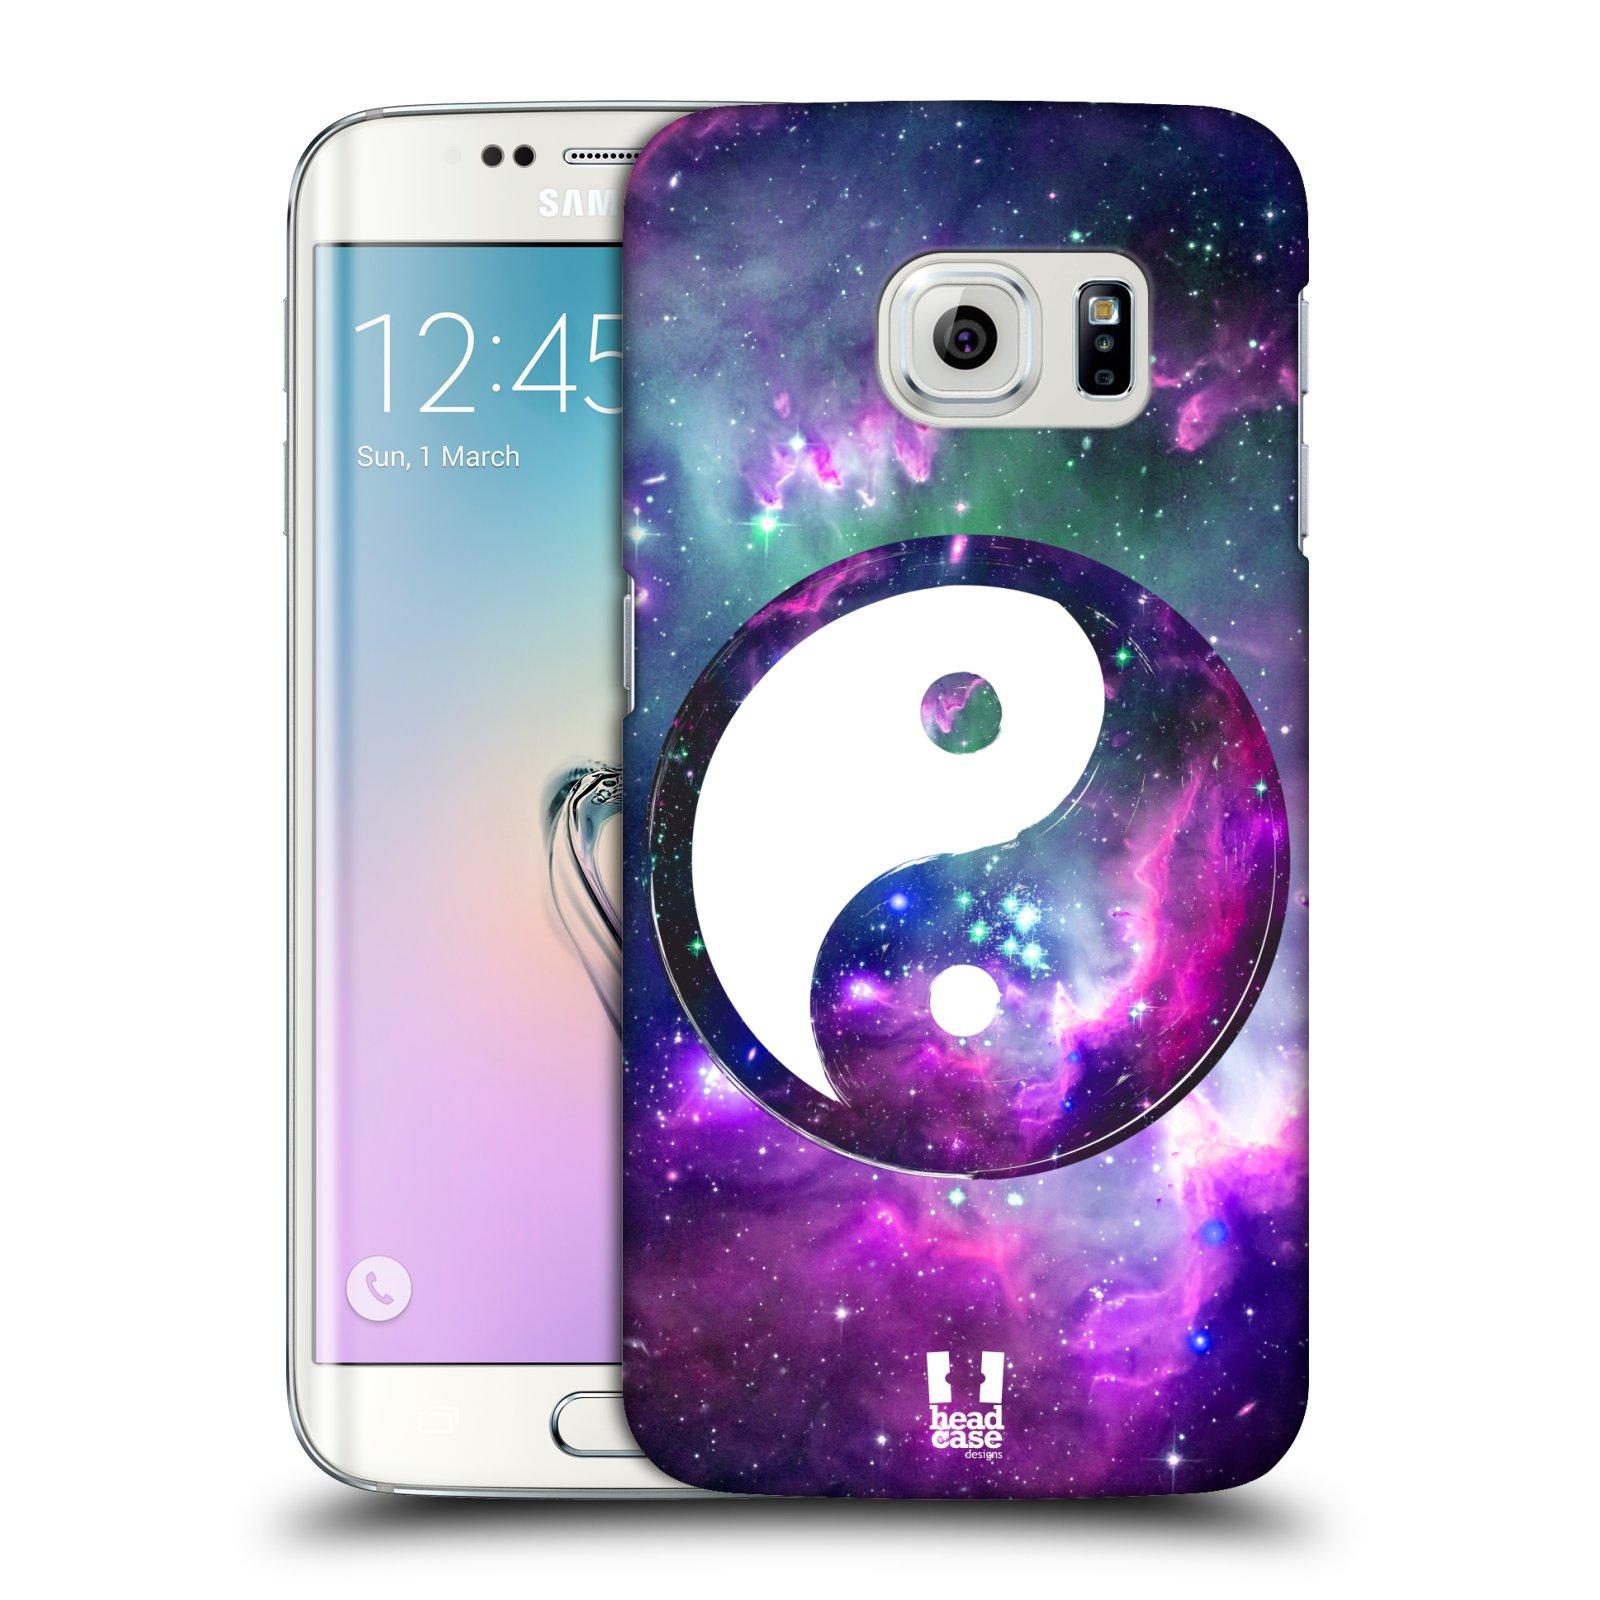 Plastové pouzdro na mobil Samsung Galaxy S6 Edge HEAD CASE Yin a Yang PURPLE (Kryt či obal na mobilní telefon Samsung Galaxy S6 Edge SM-G925F)